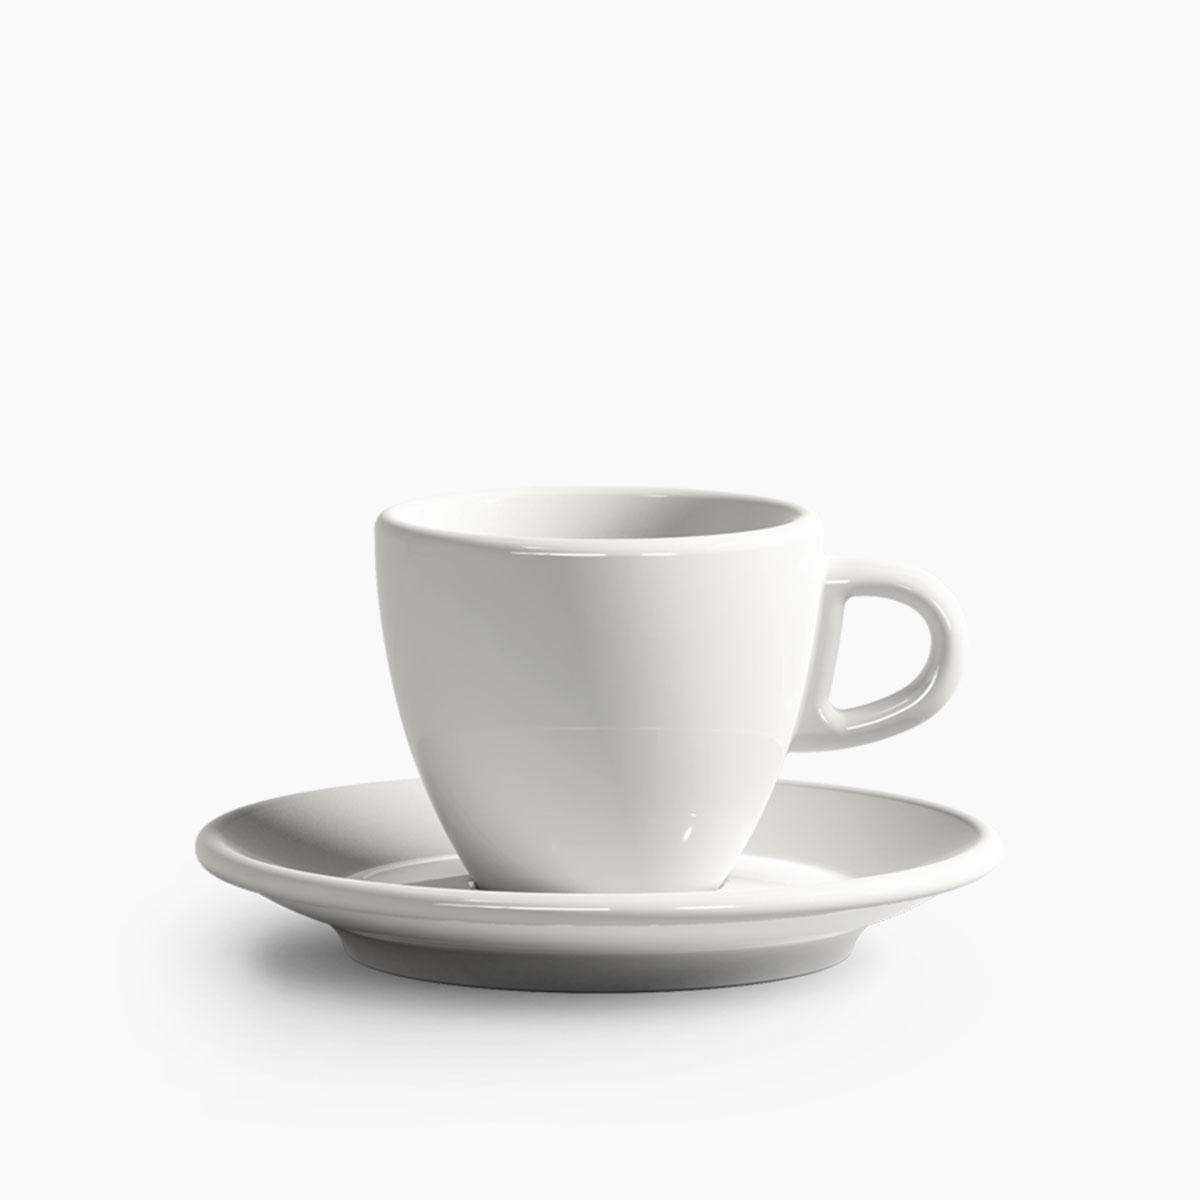 VIOLA DOUBLE COFFEE BIANCO 110ml